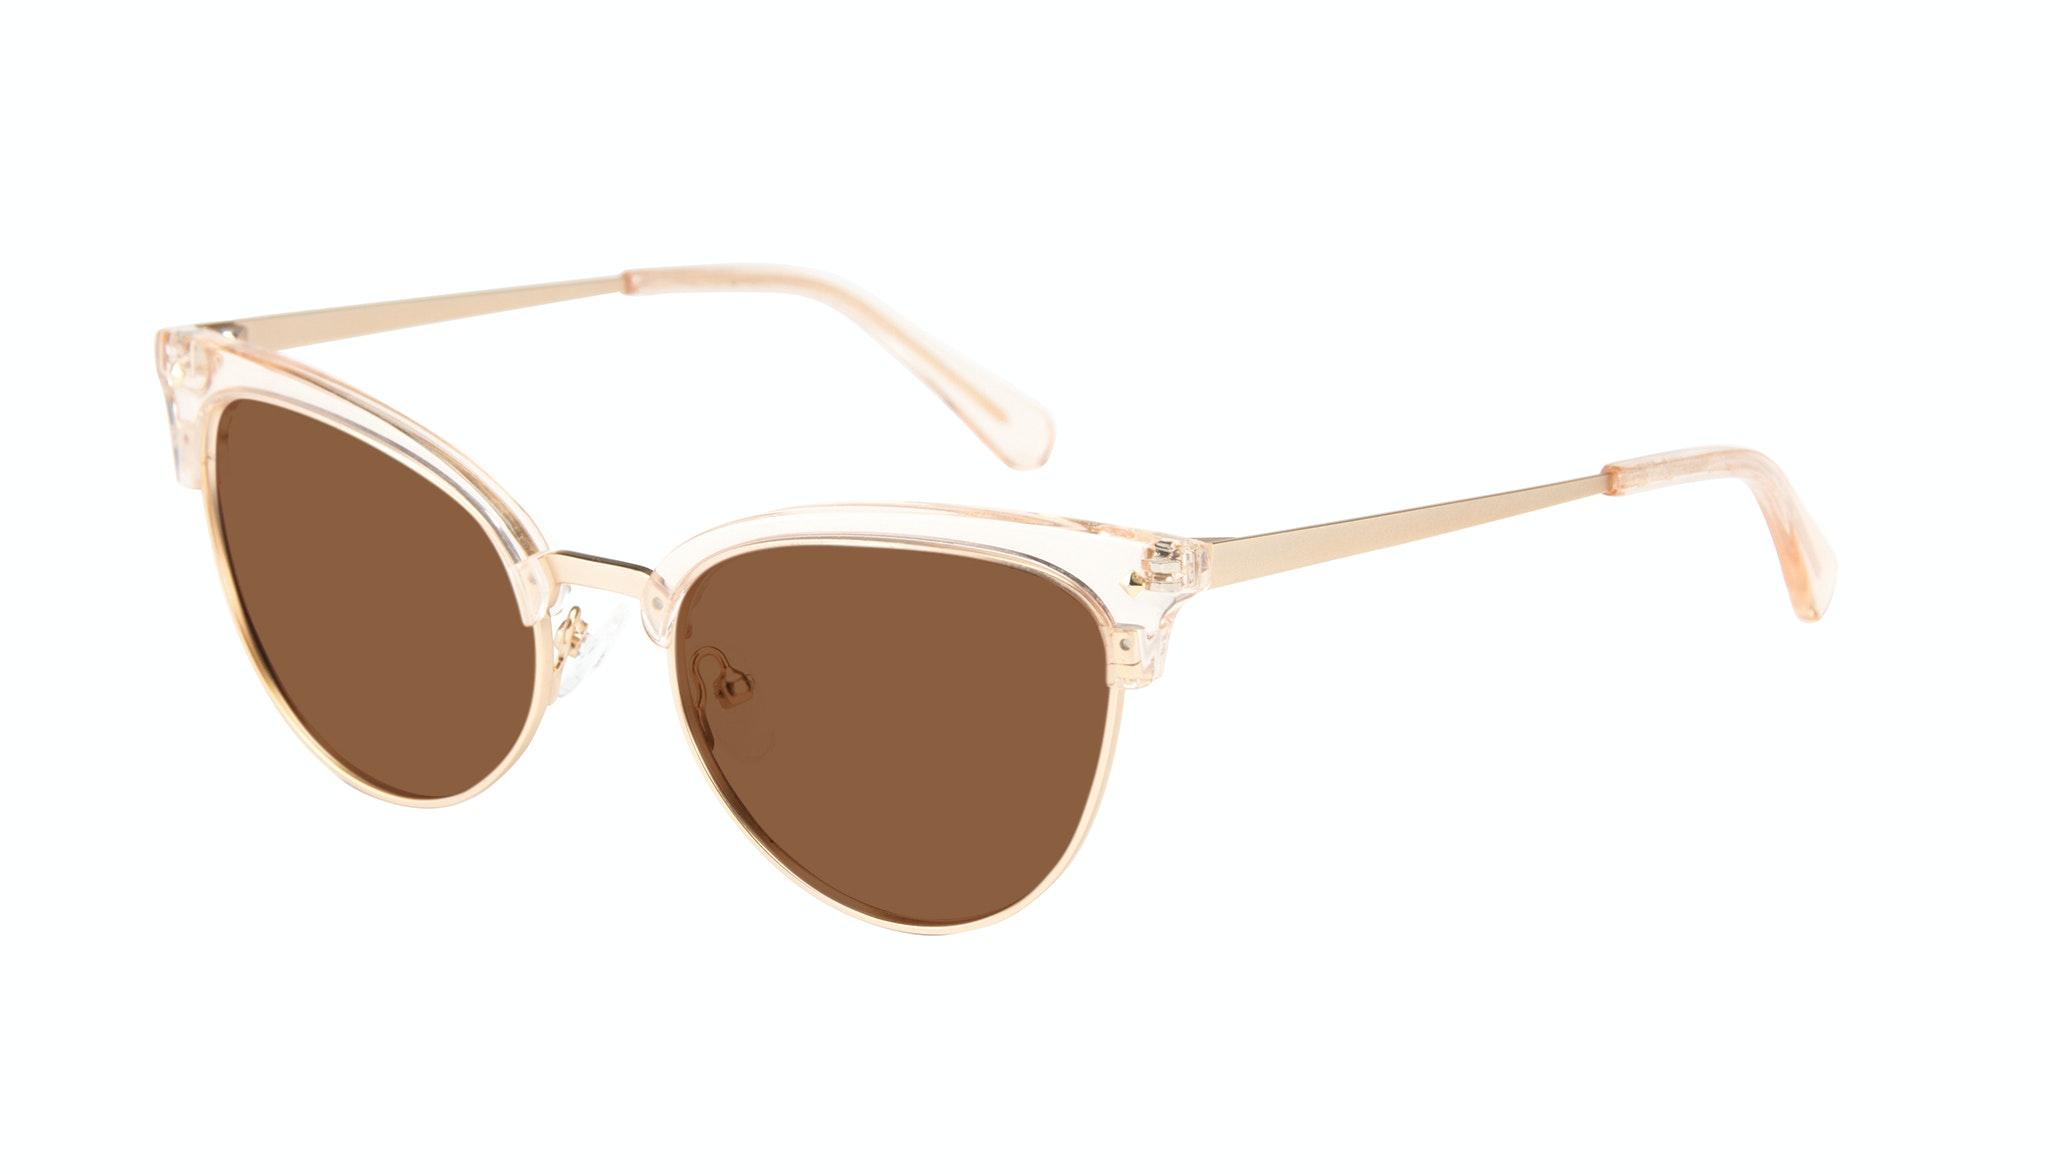 Affordable Fashion Glasses Cat Eye Daring Cateye Sunglasses Women Moon Blond Tilt